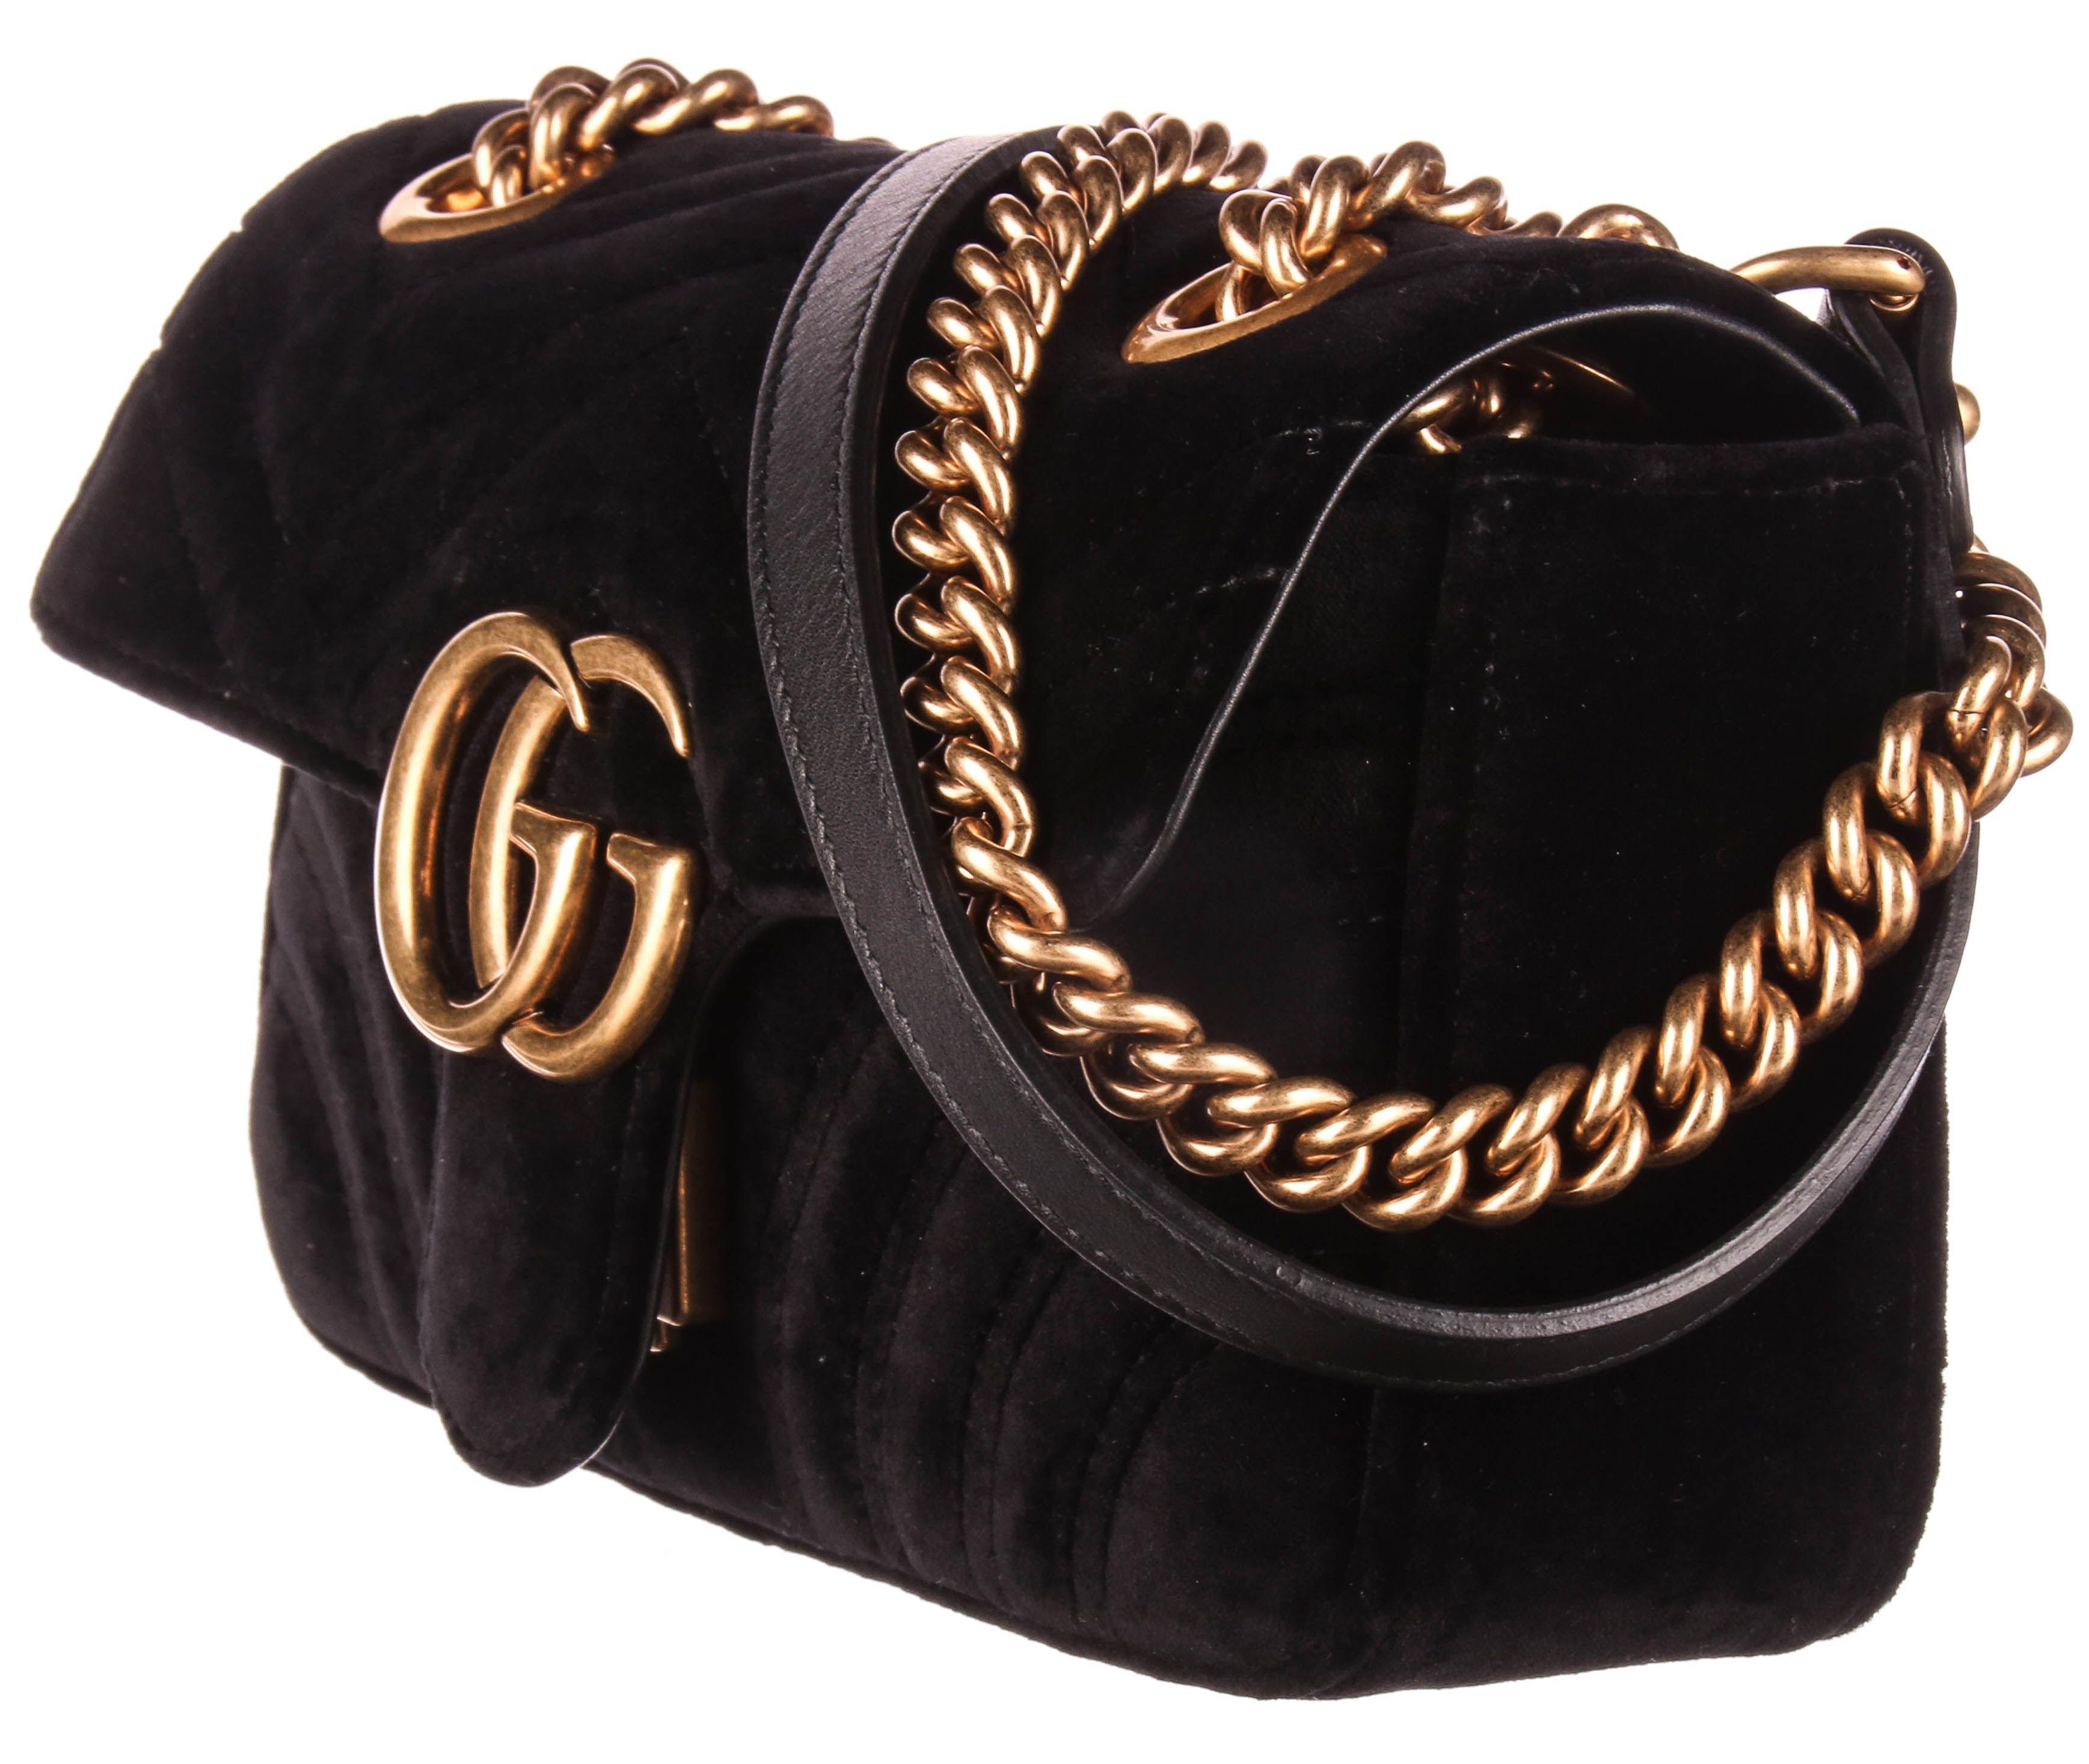 Brand Gucci Style Shoulder Gender Women S Material Velvetc